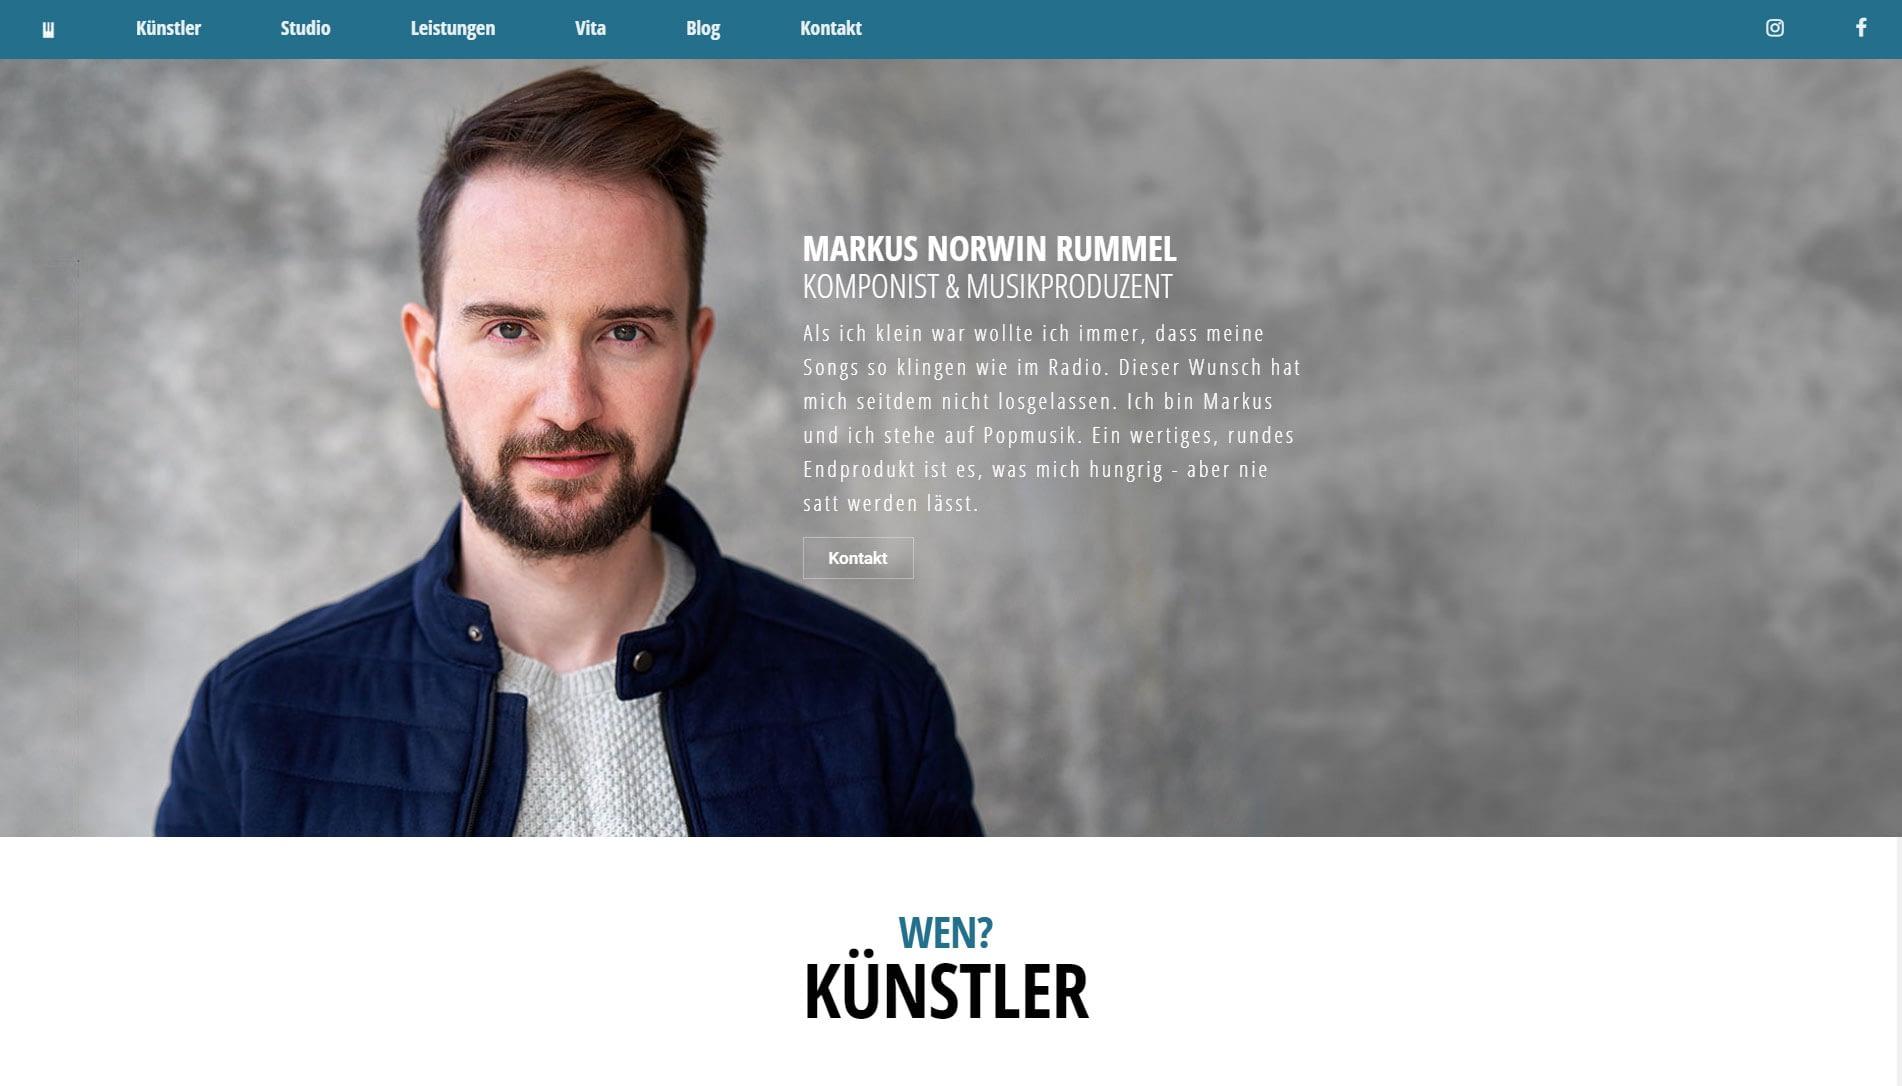 Markus-Norwin-Rummel-Website